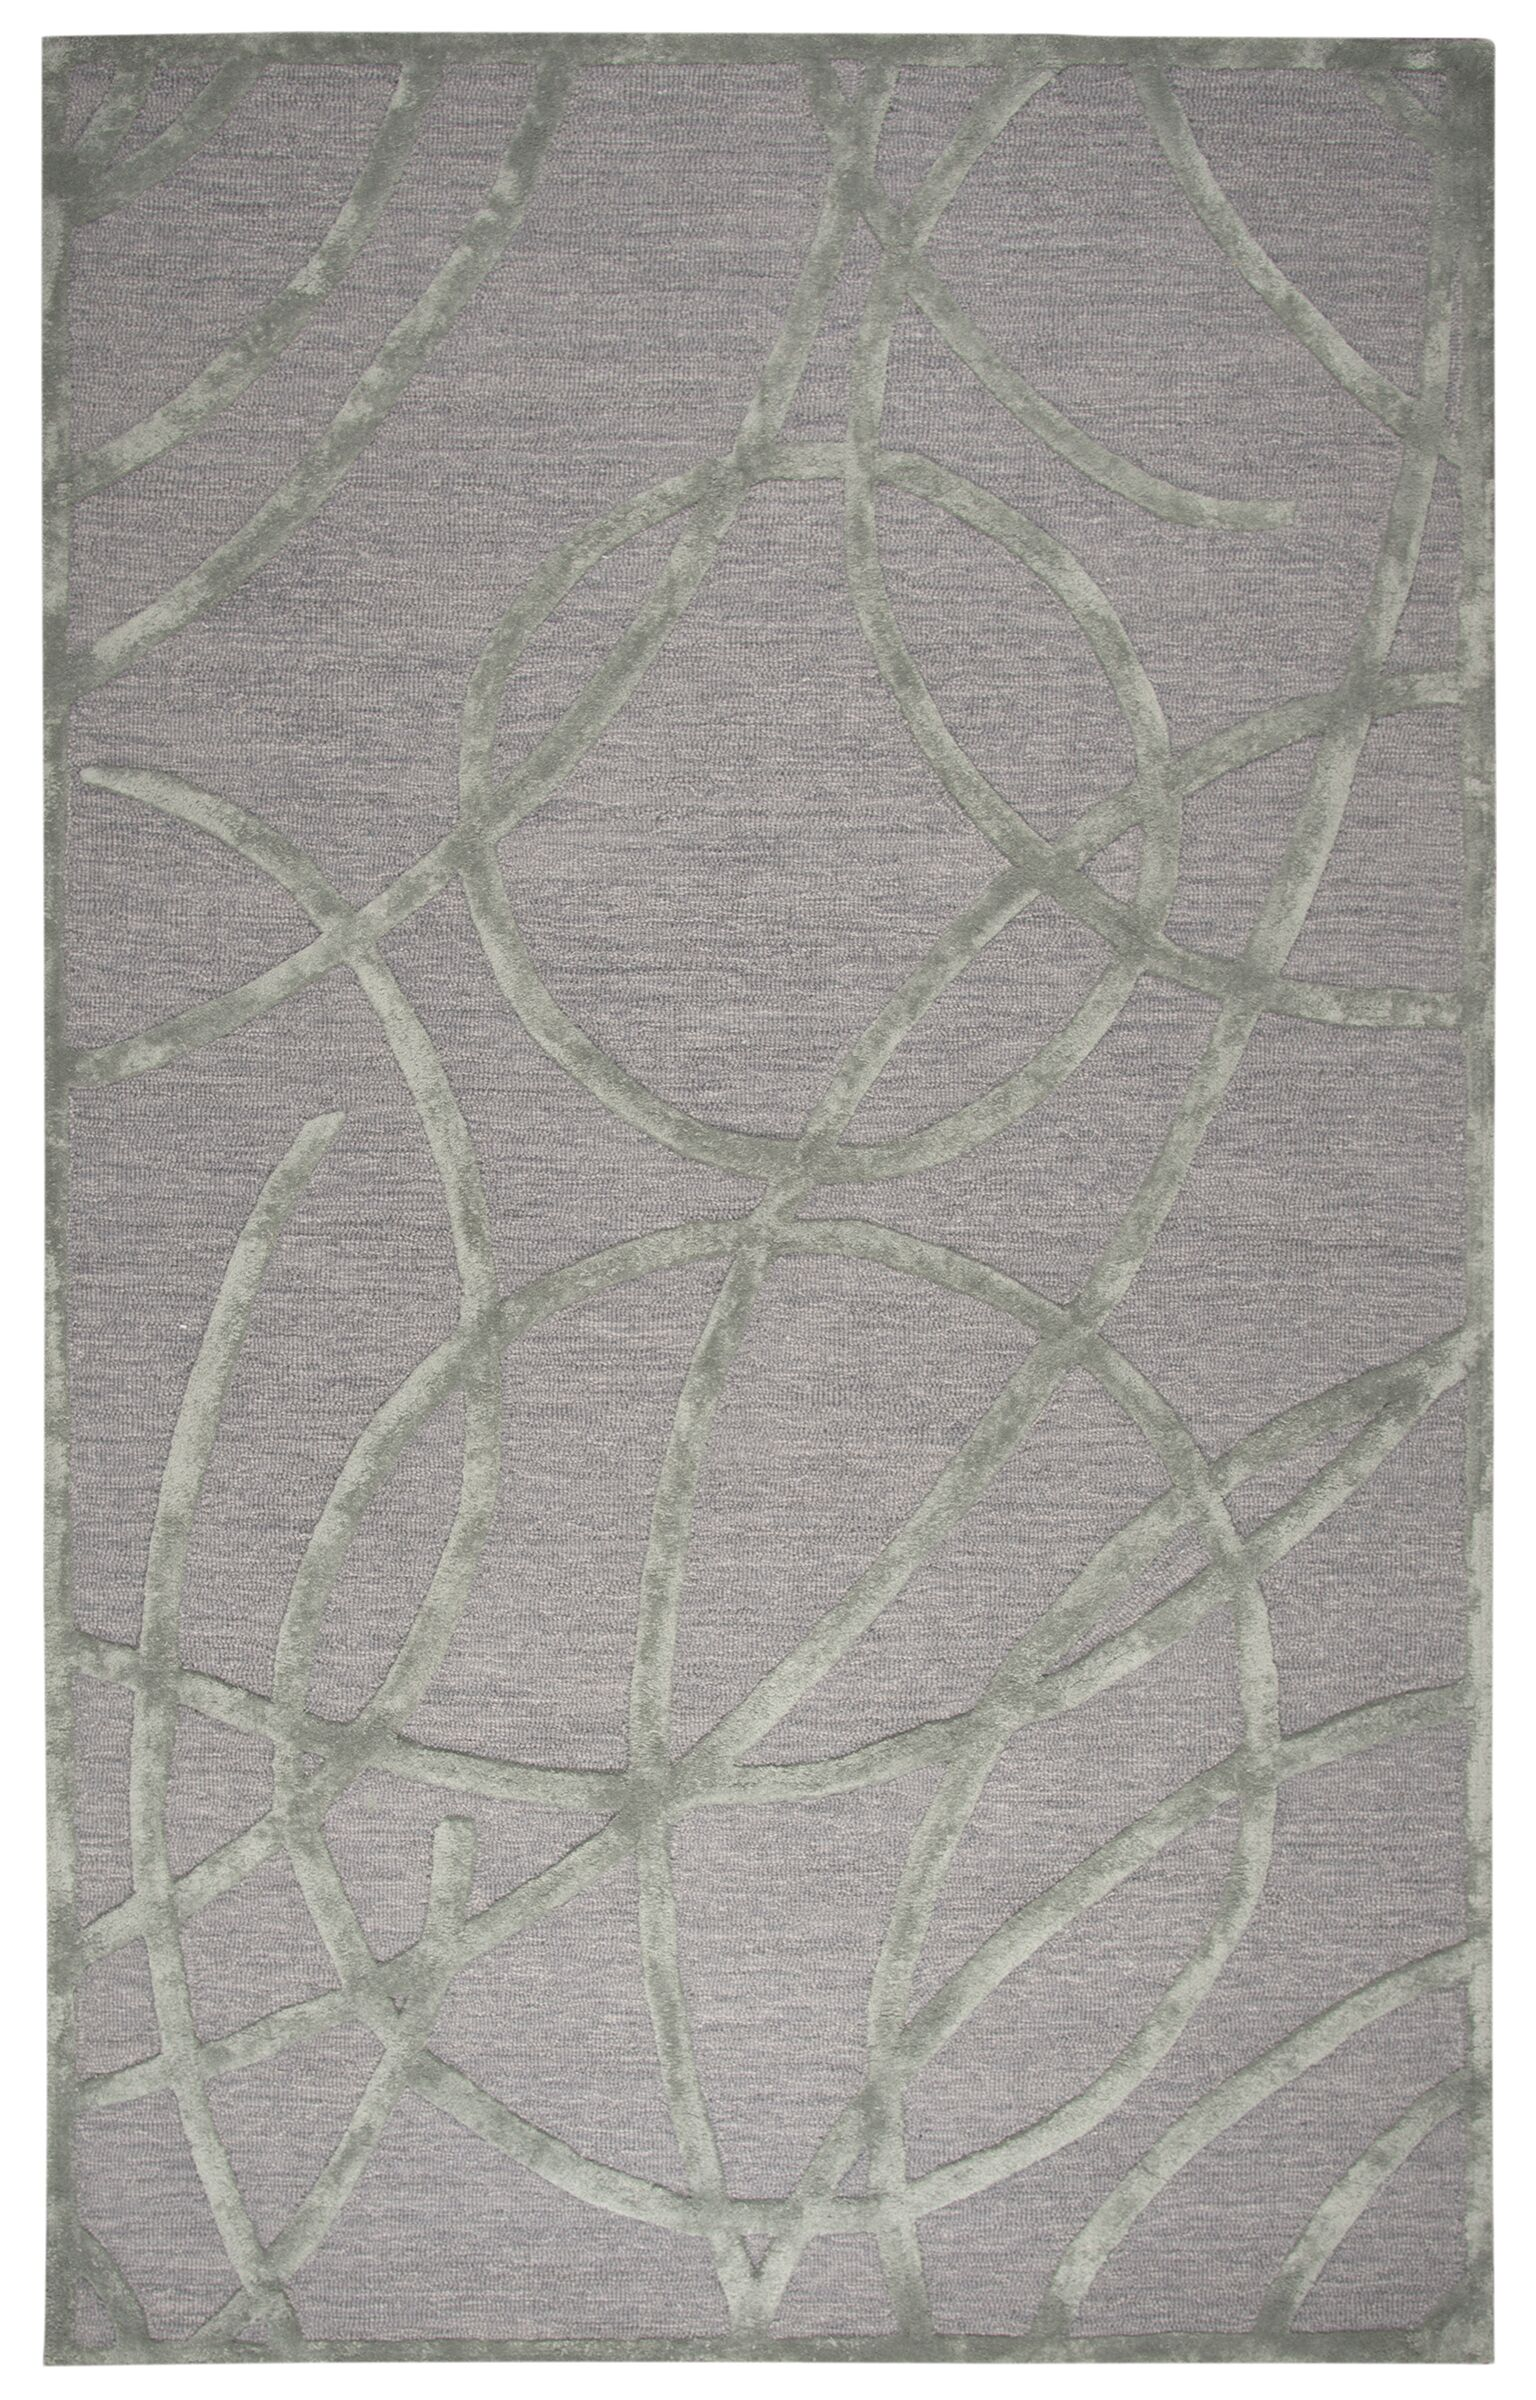 Climenhaga Hand-Tufted Tan/Gold Area Rug Size: Rectangle 9' x 12'